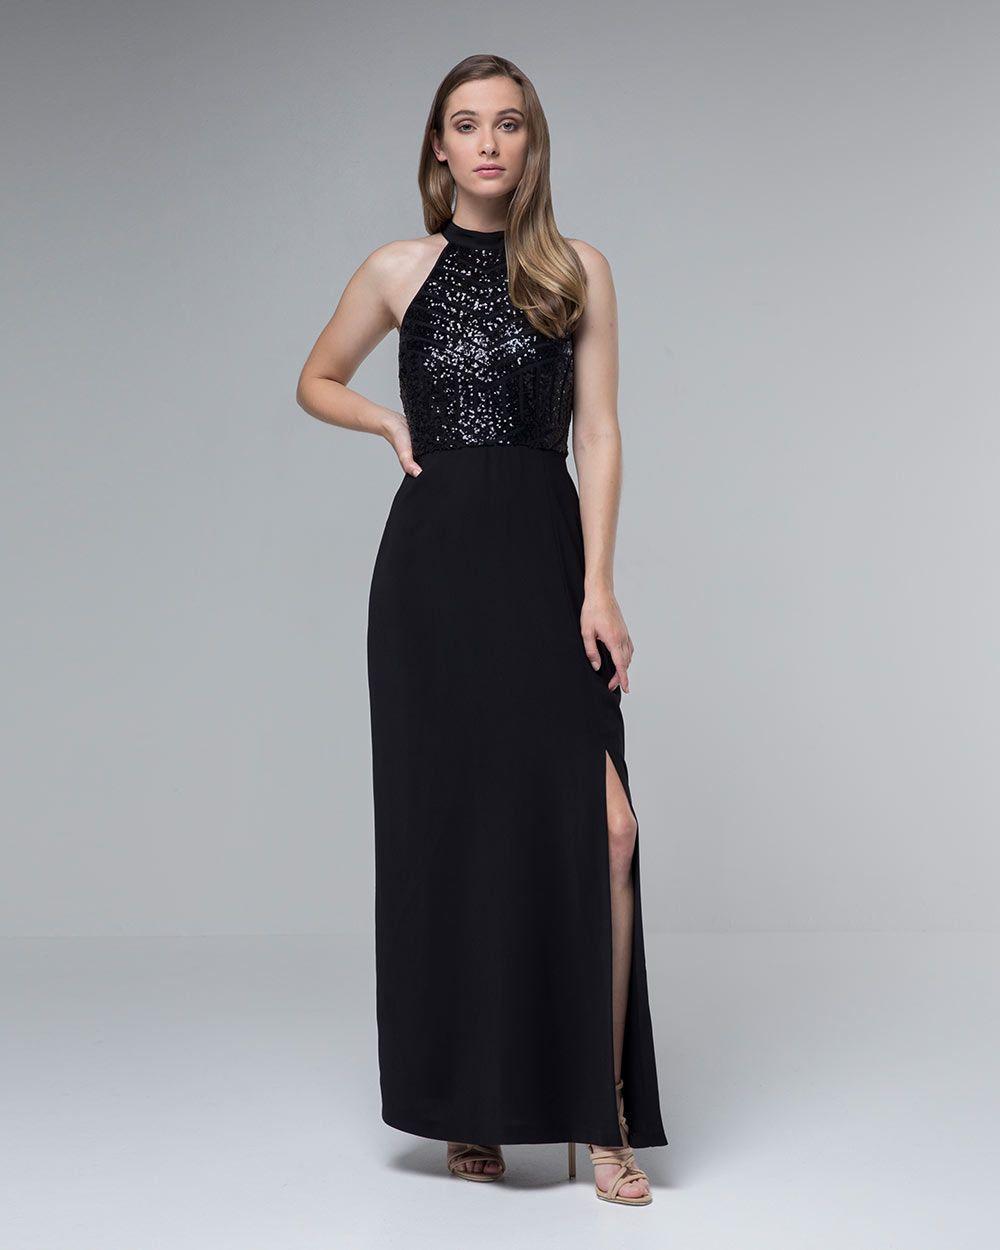 Effie Dress Womens Clothing Online Formal Dresses Evening